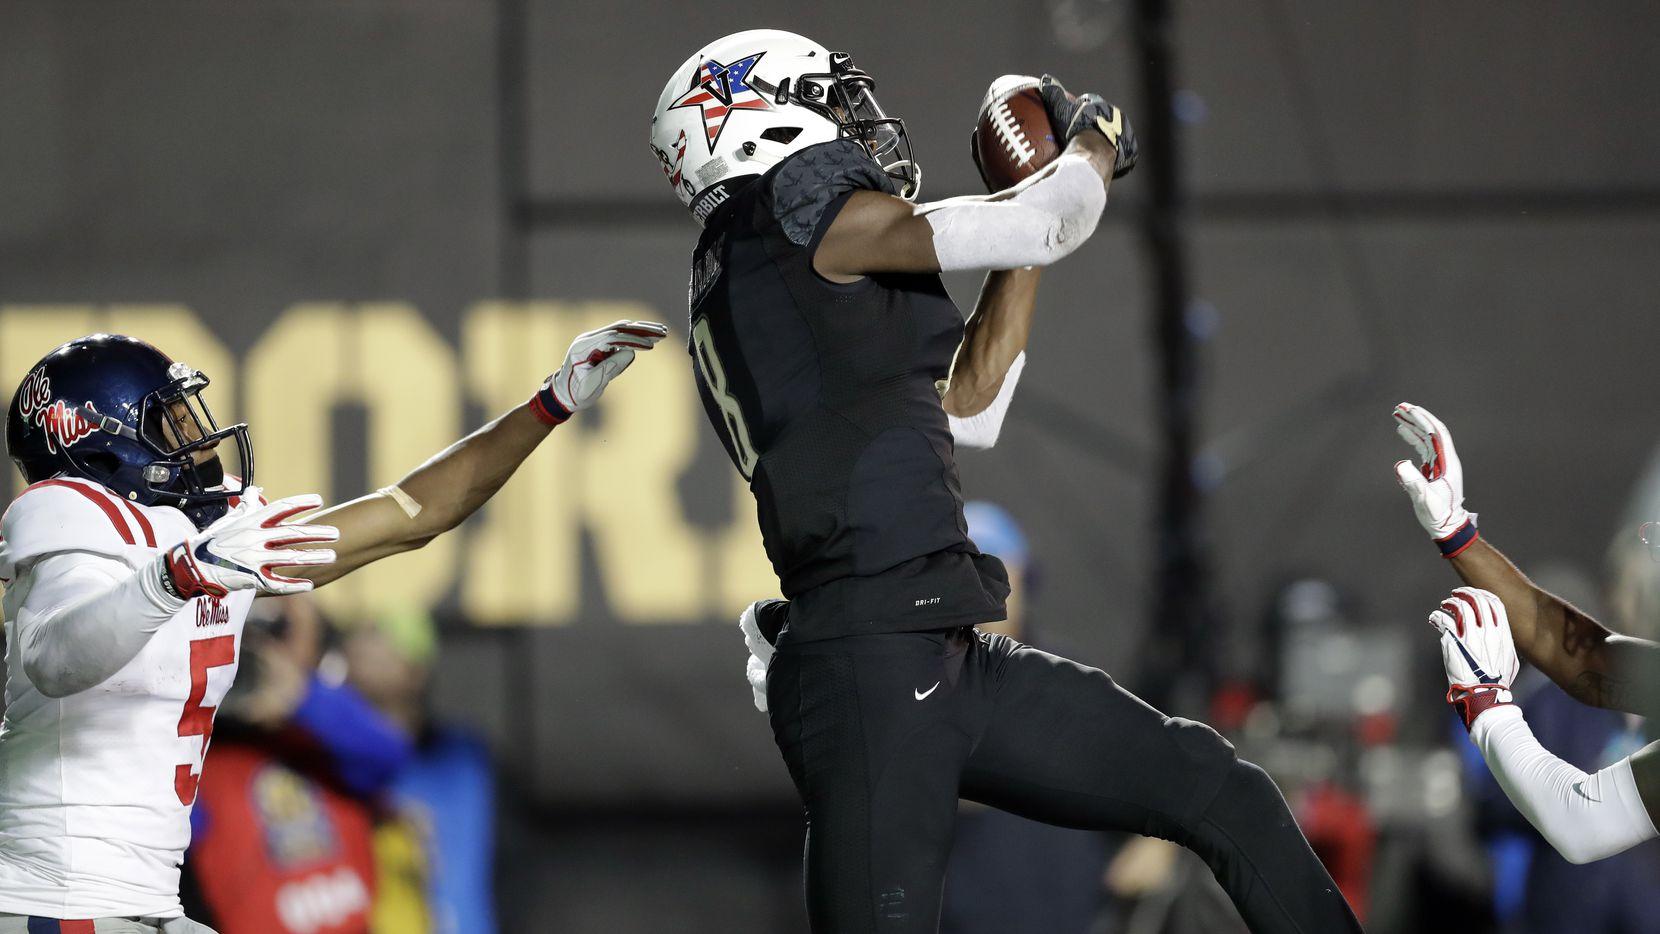 FILE - Vanderbilt cornerback Joejuan Williams (8) intercepts a pass intended for Ole Miss wide receiver DaMarkus Lodge (5) during the second half of a game on Saturday, Nov. 17, 2018, in Nashville, Tenn. (AP Photo/Mark Humphrey)